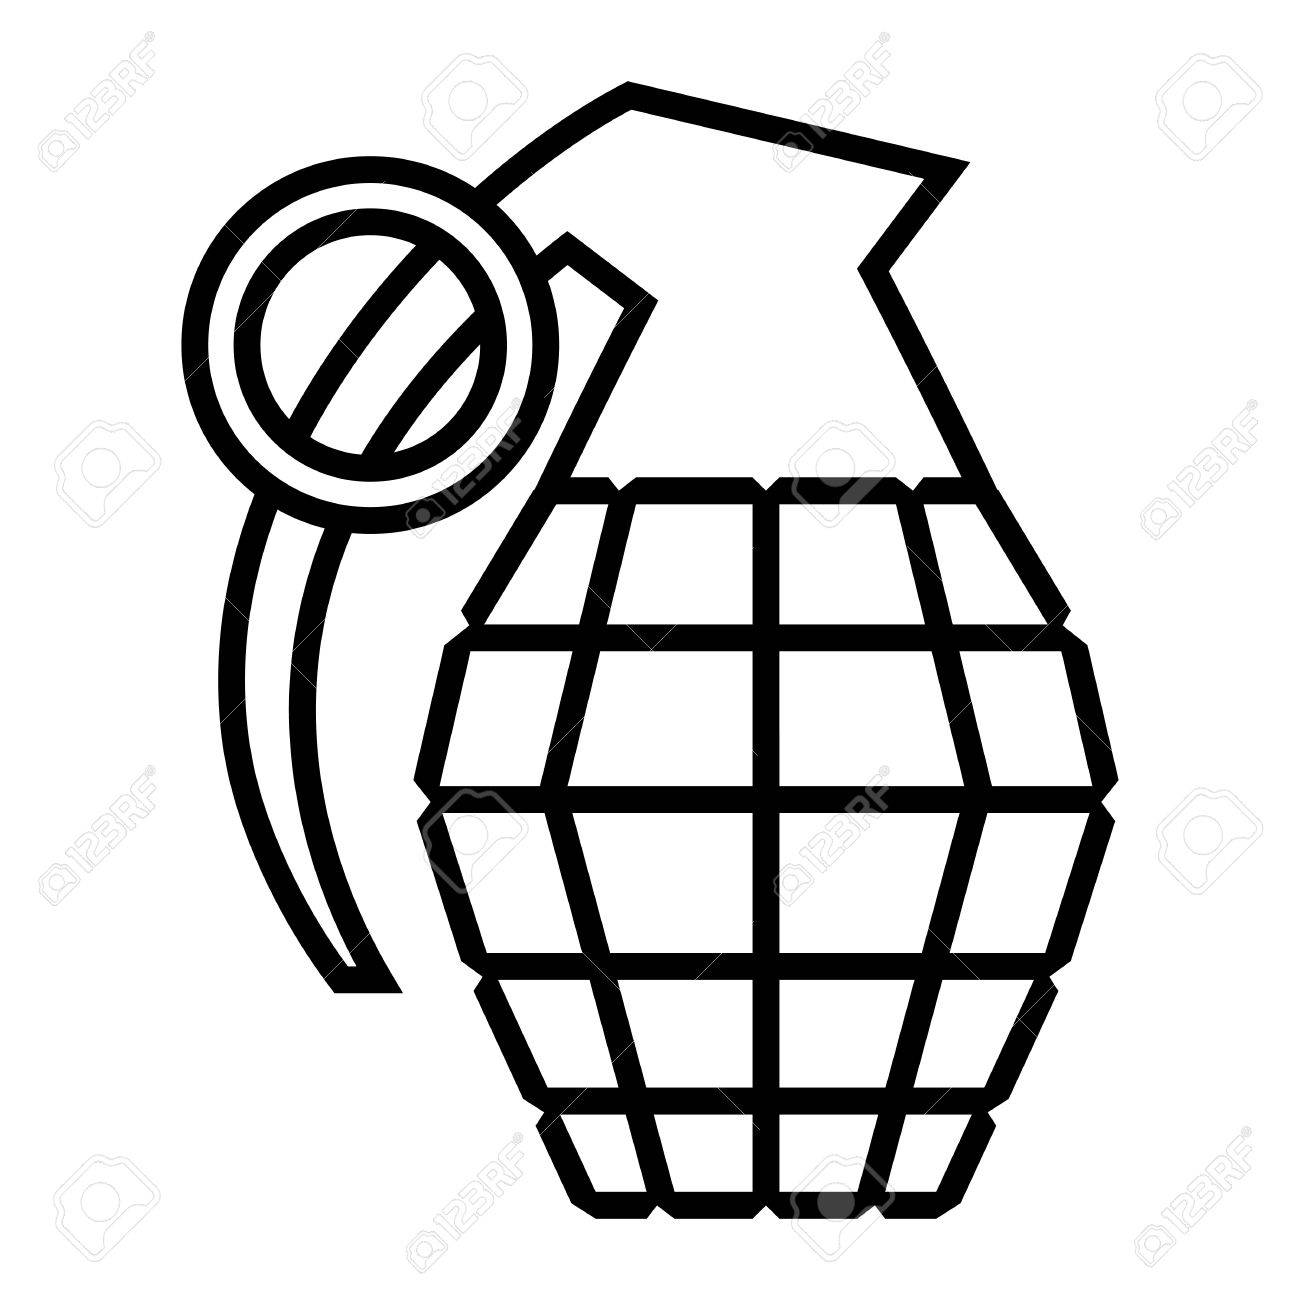 hand grenade vector illustration royalty free cliparts vectors and rh 123rf com Hand Grenade Clip Art Pineapple Grenade Vector